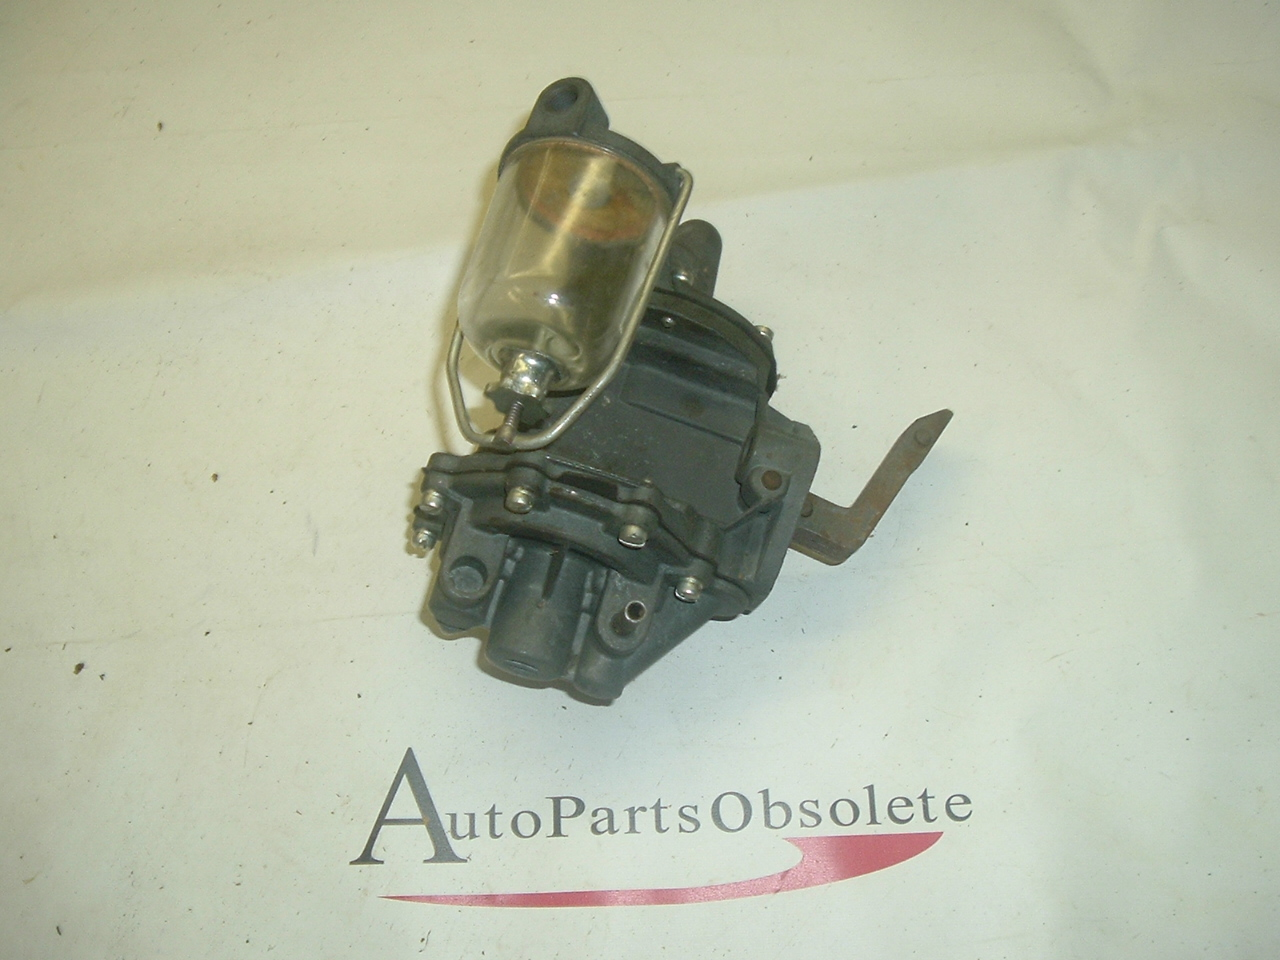 1951 Ford double action fuel pump reman#9599 (a 9599xt)